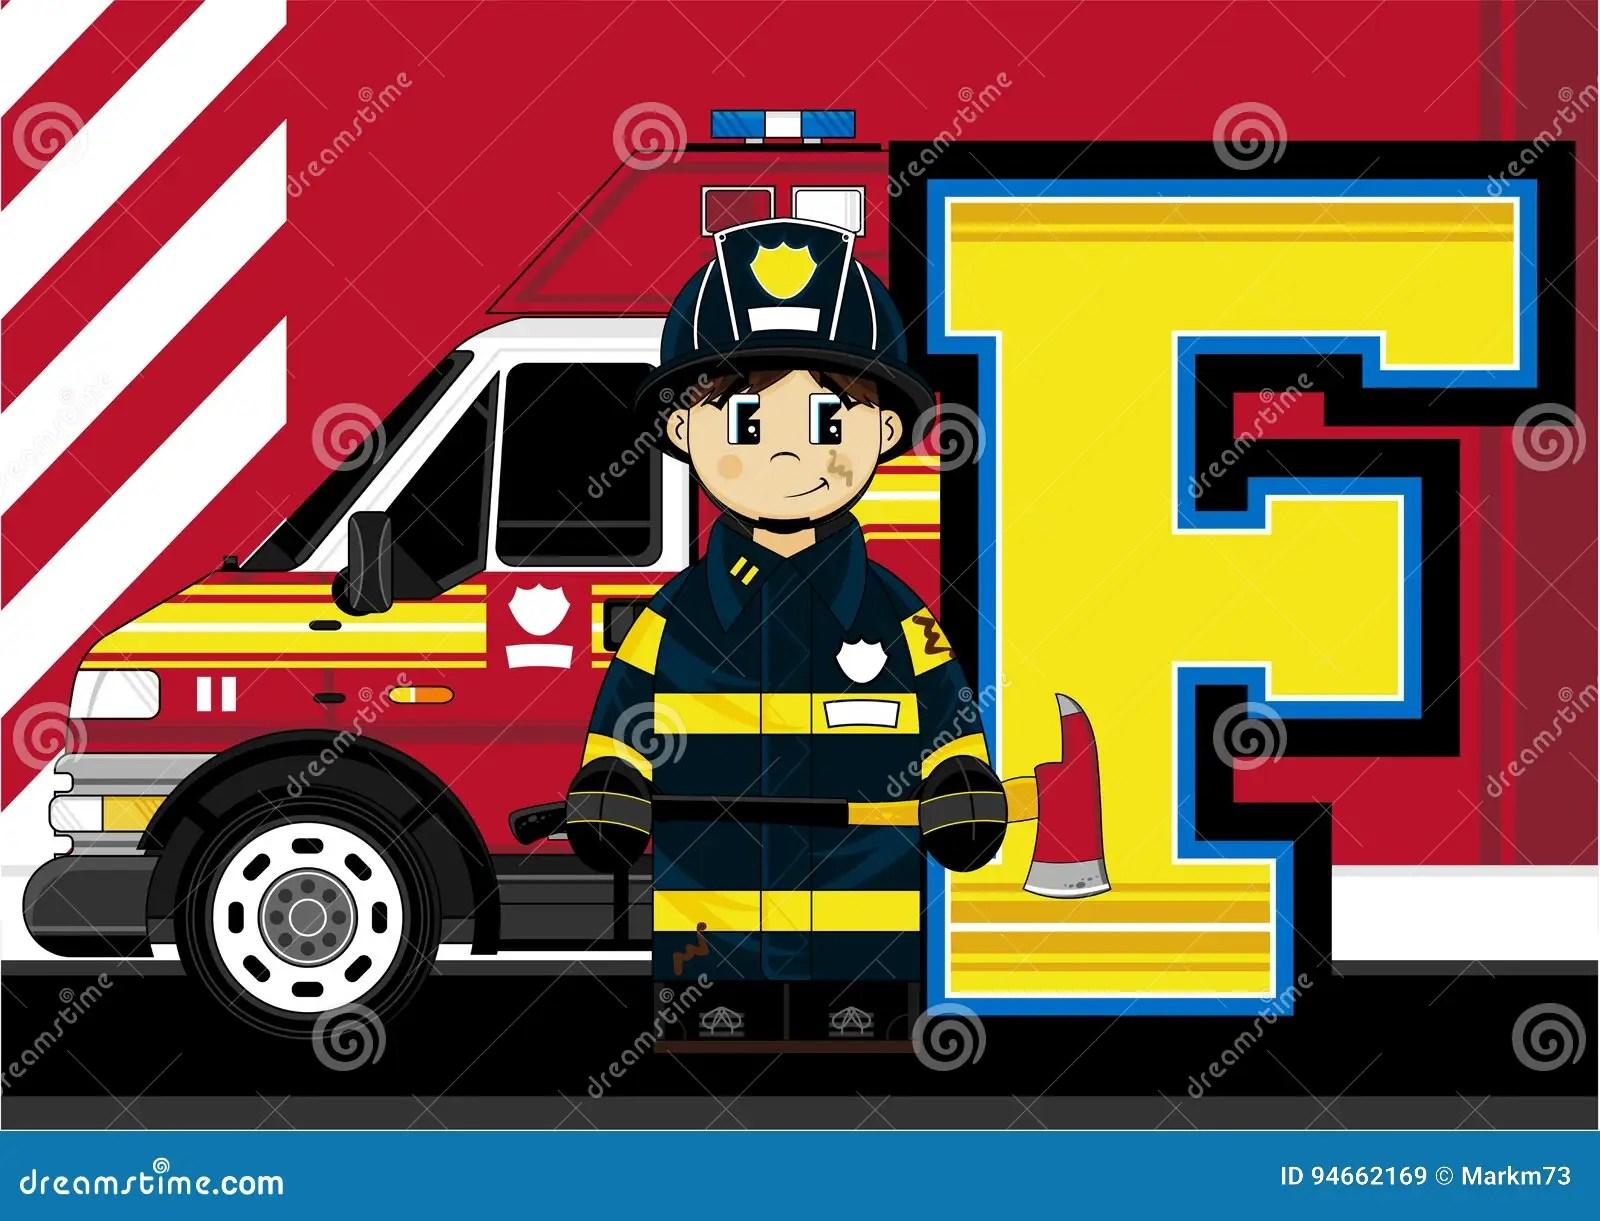 F Is For Fireman Stock Vector Illustration Of Firetruck